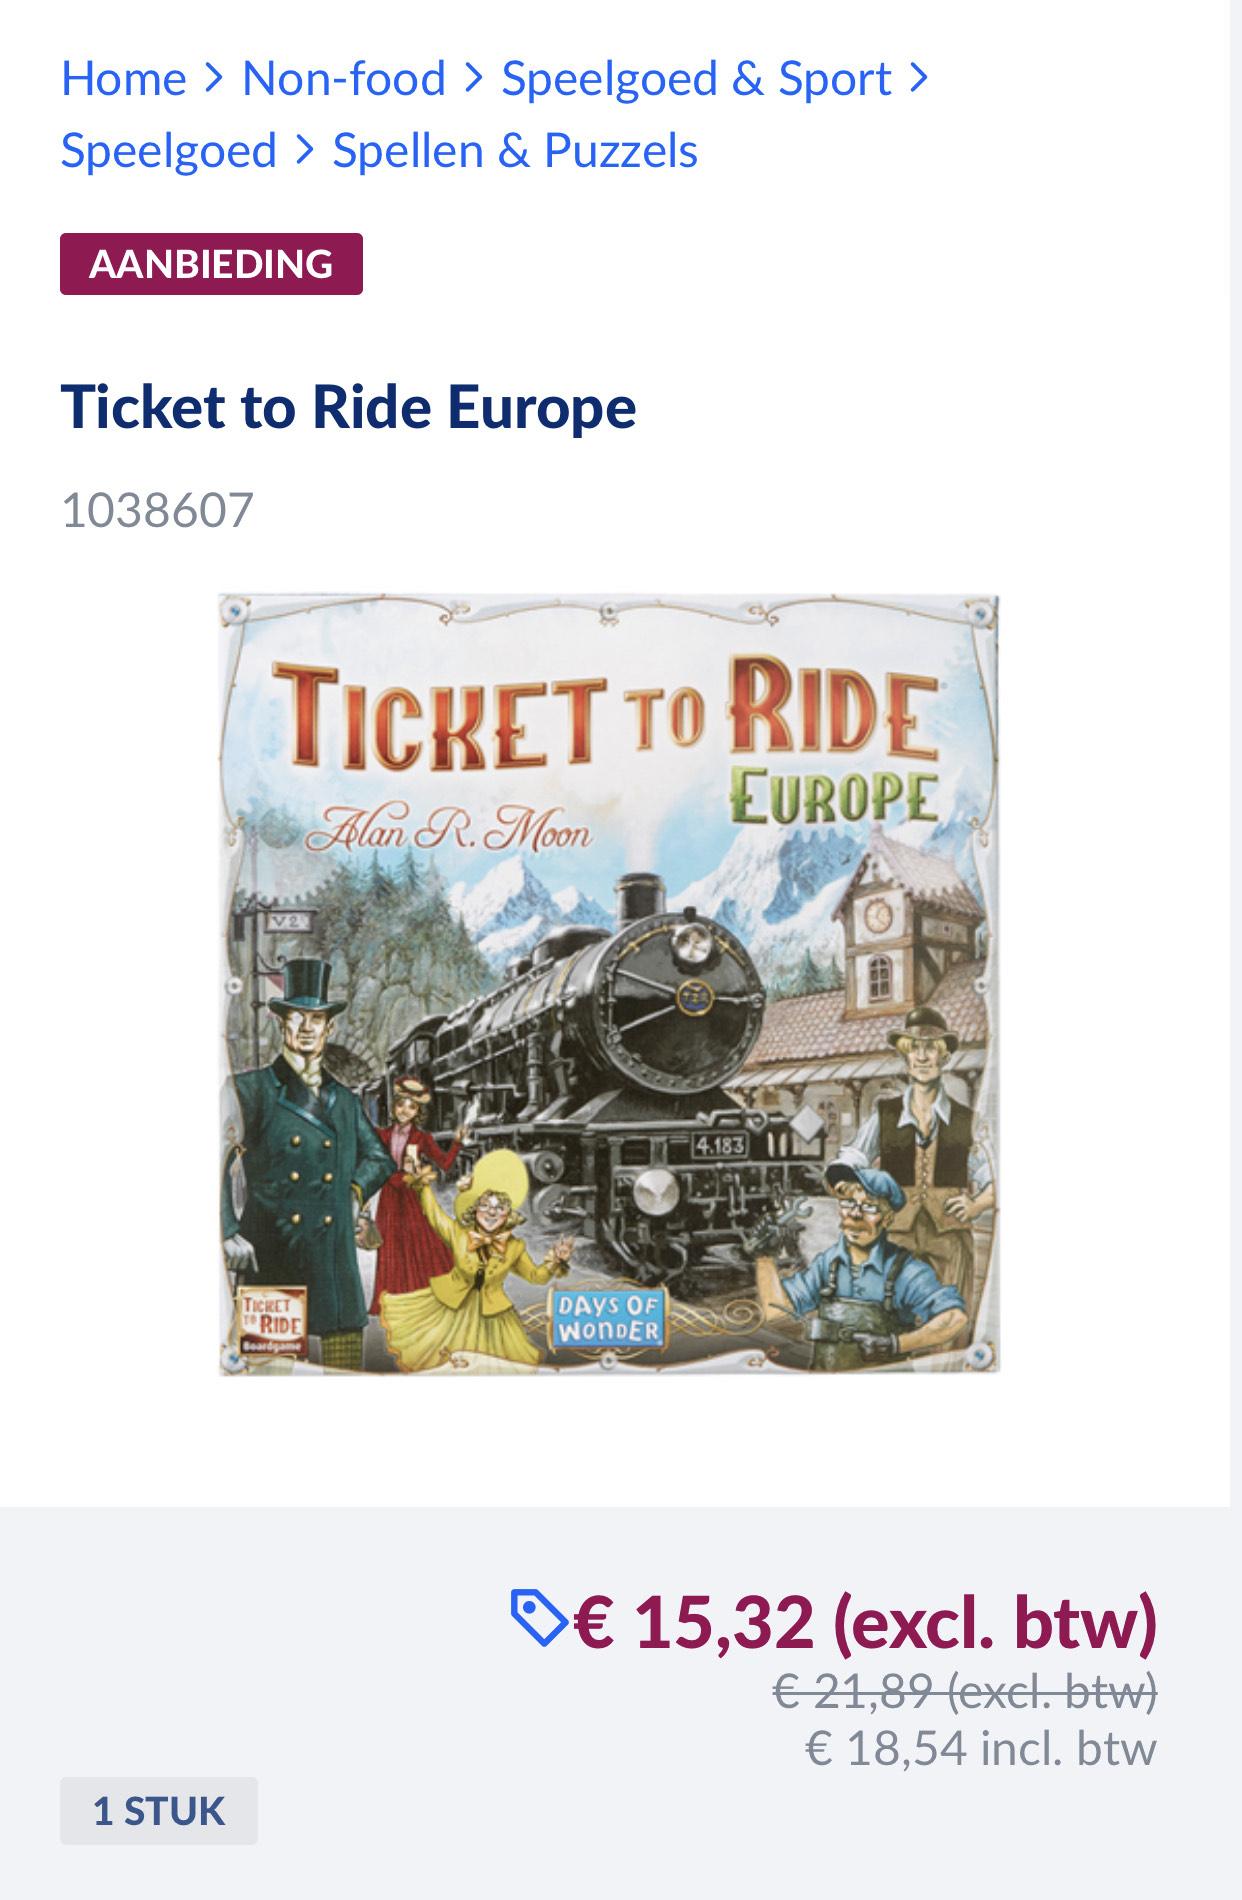 Black friday actie Ticket to ride Europa